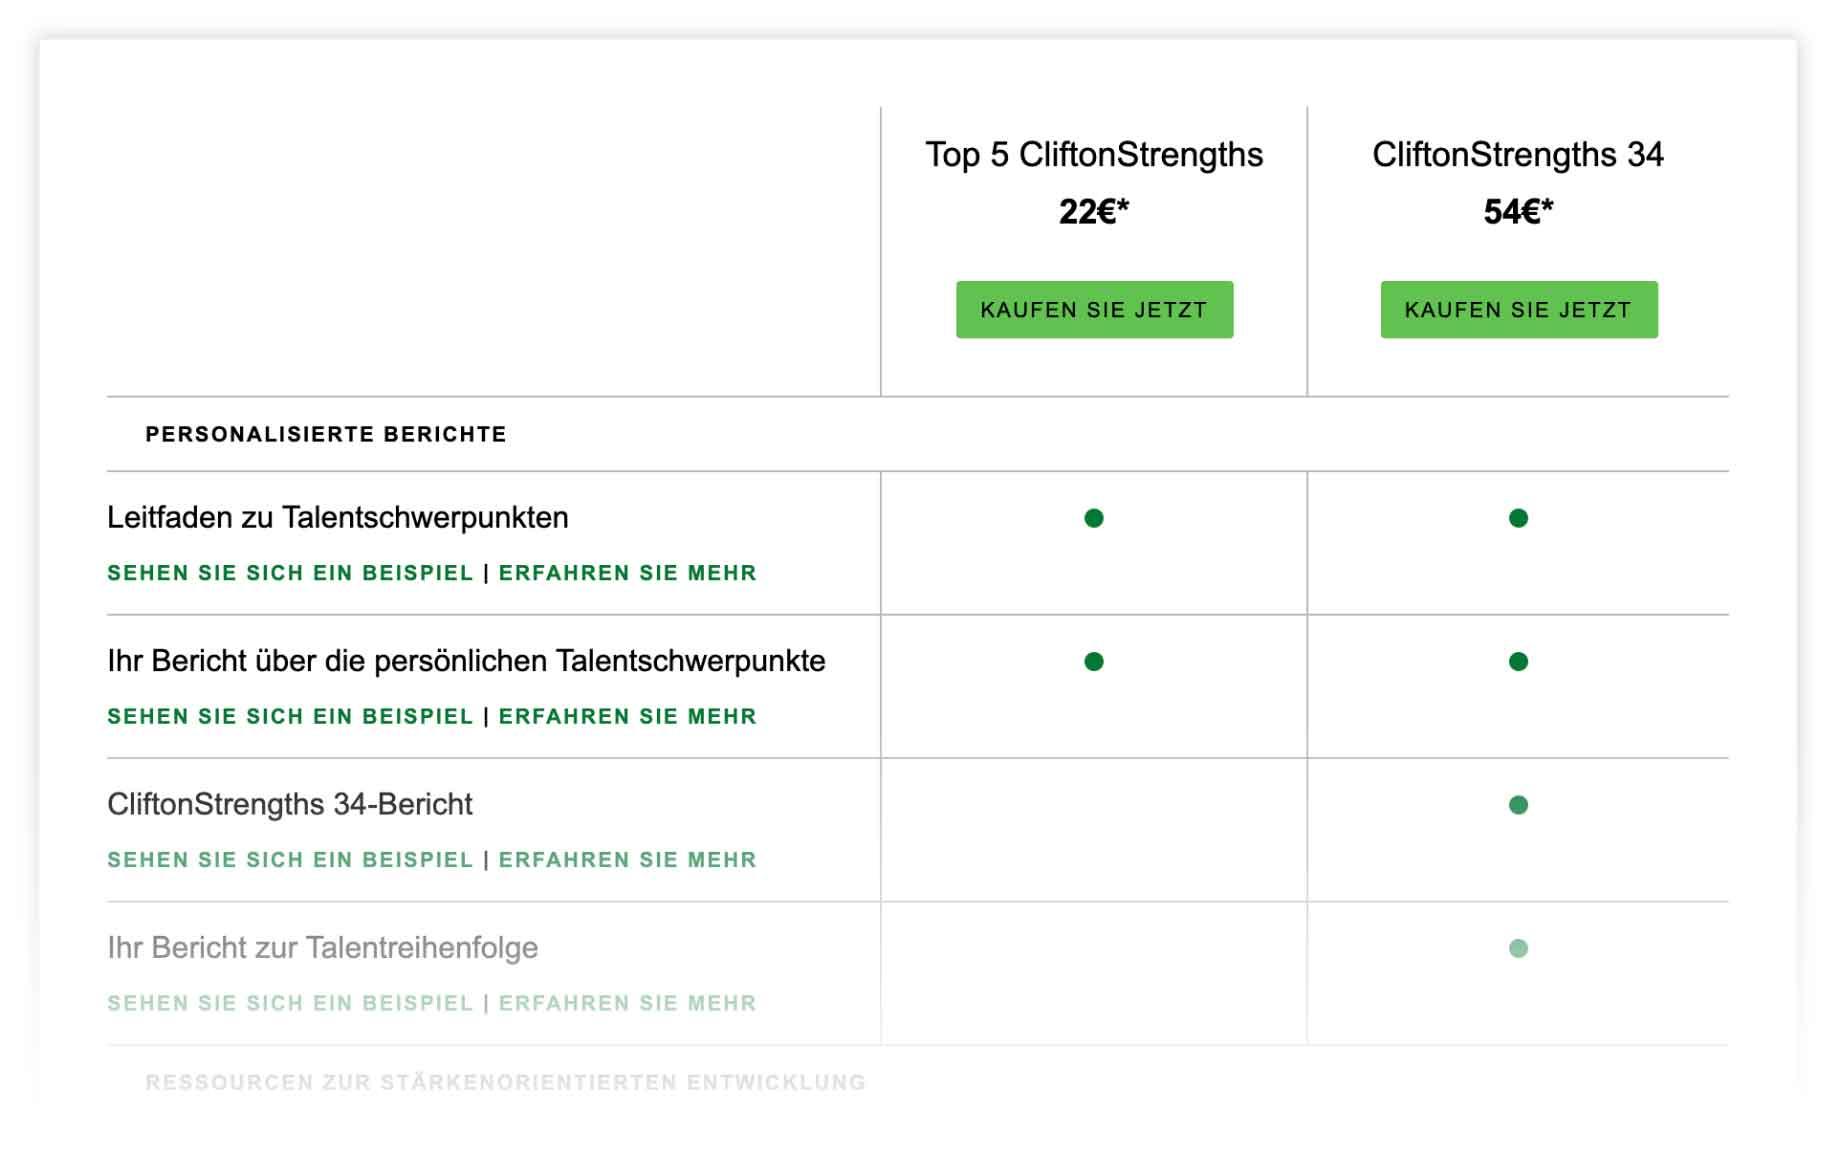 Vergleichstabelle der CliftonStrengths-Kaufoptionen